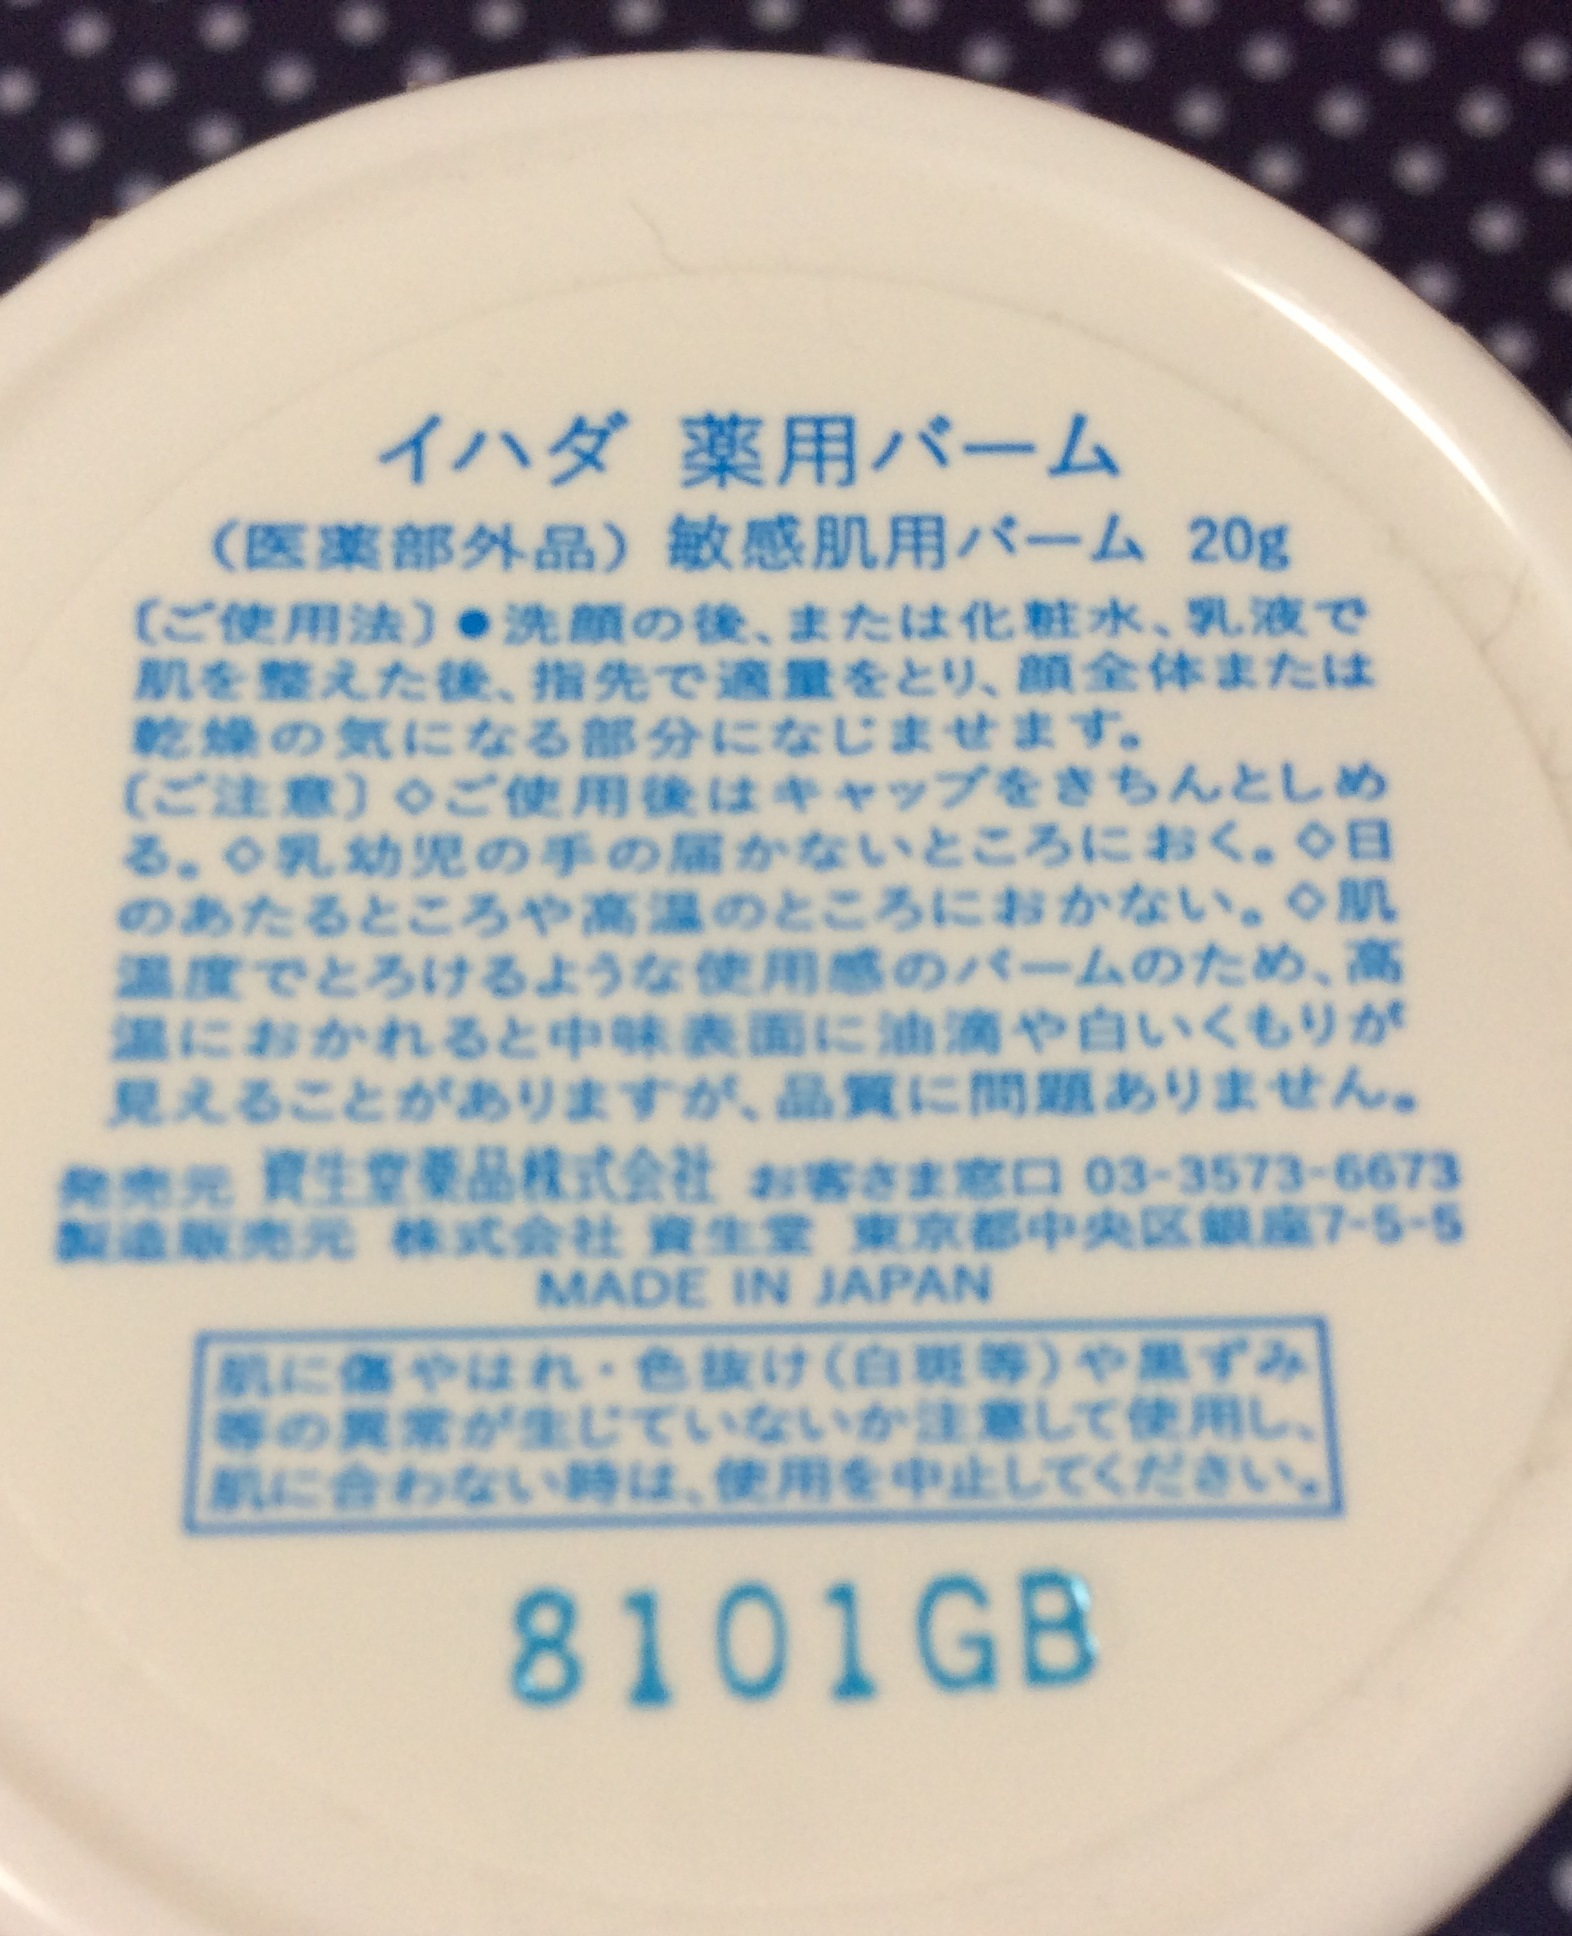 FBECF69E-83A6-4E7E-9BDD-12E8ACDA4BF4.jpeg